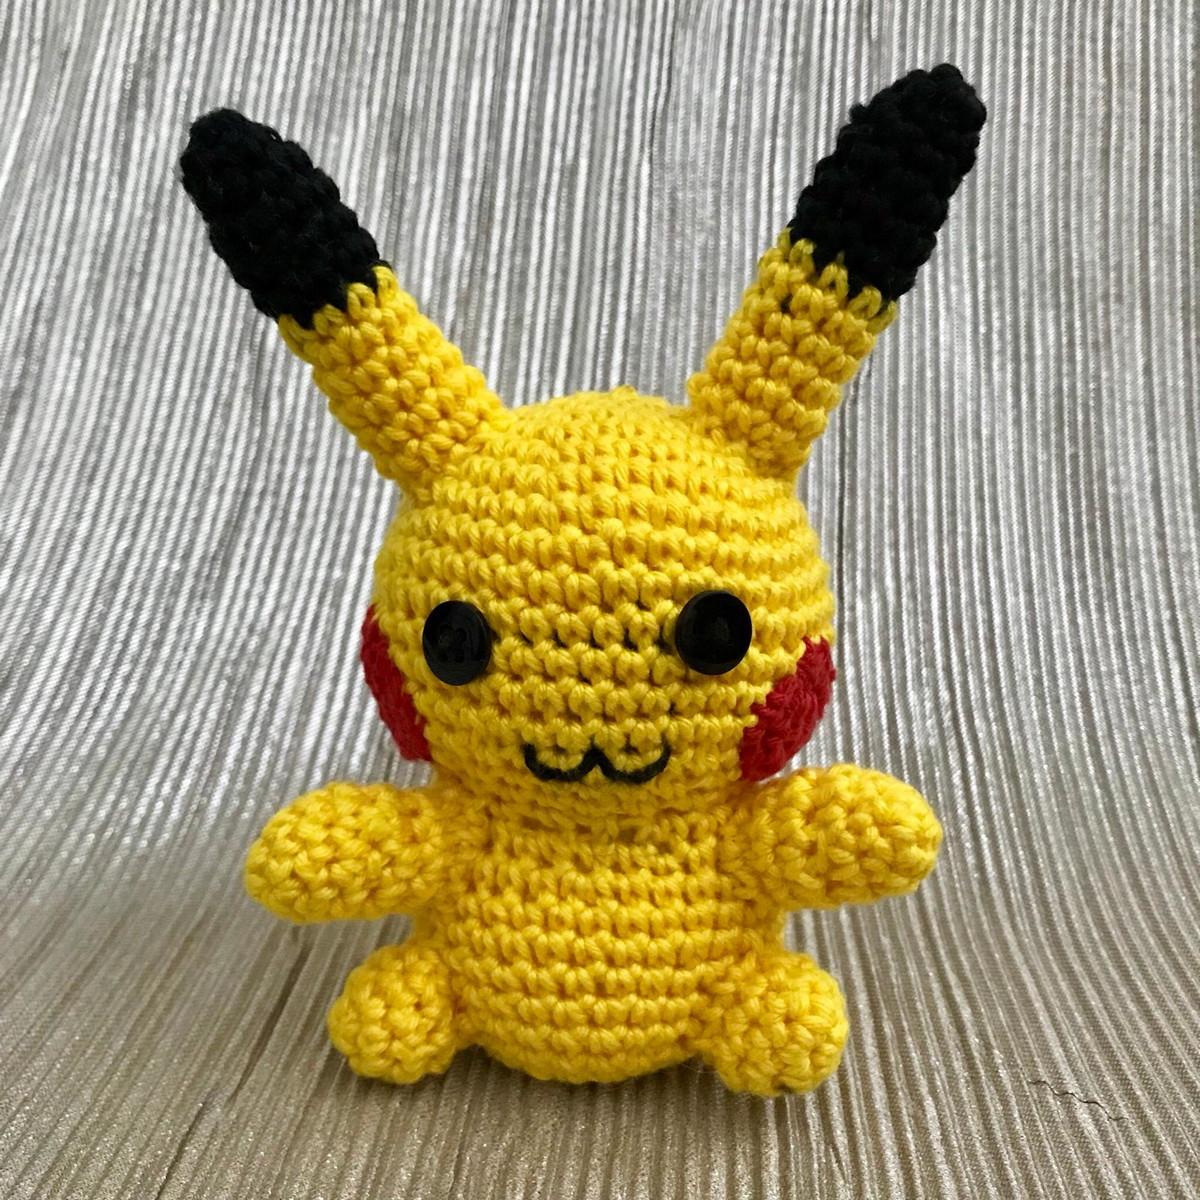 Amigurumi Pikachu no Elo7 | DoForMe - HandCraft Art (AD4B62)